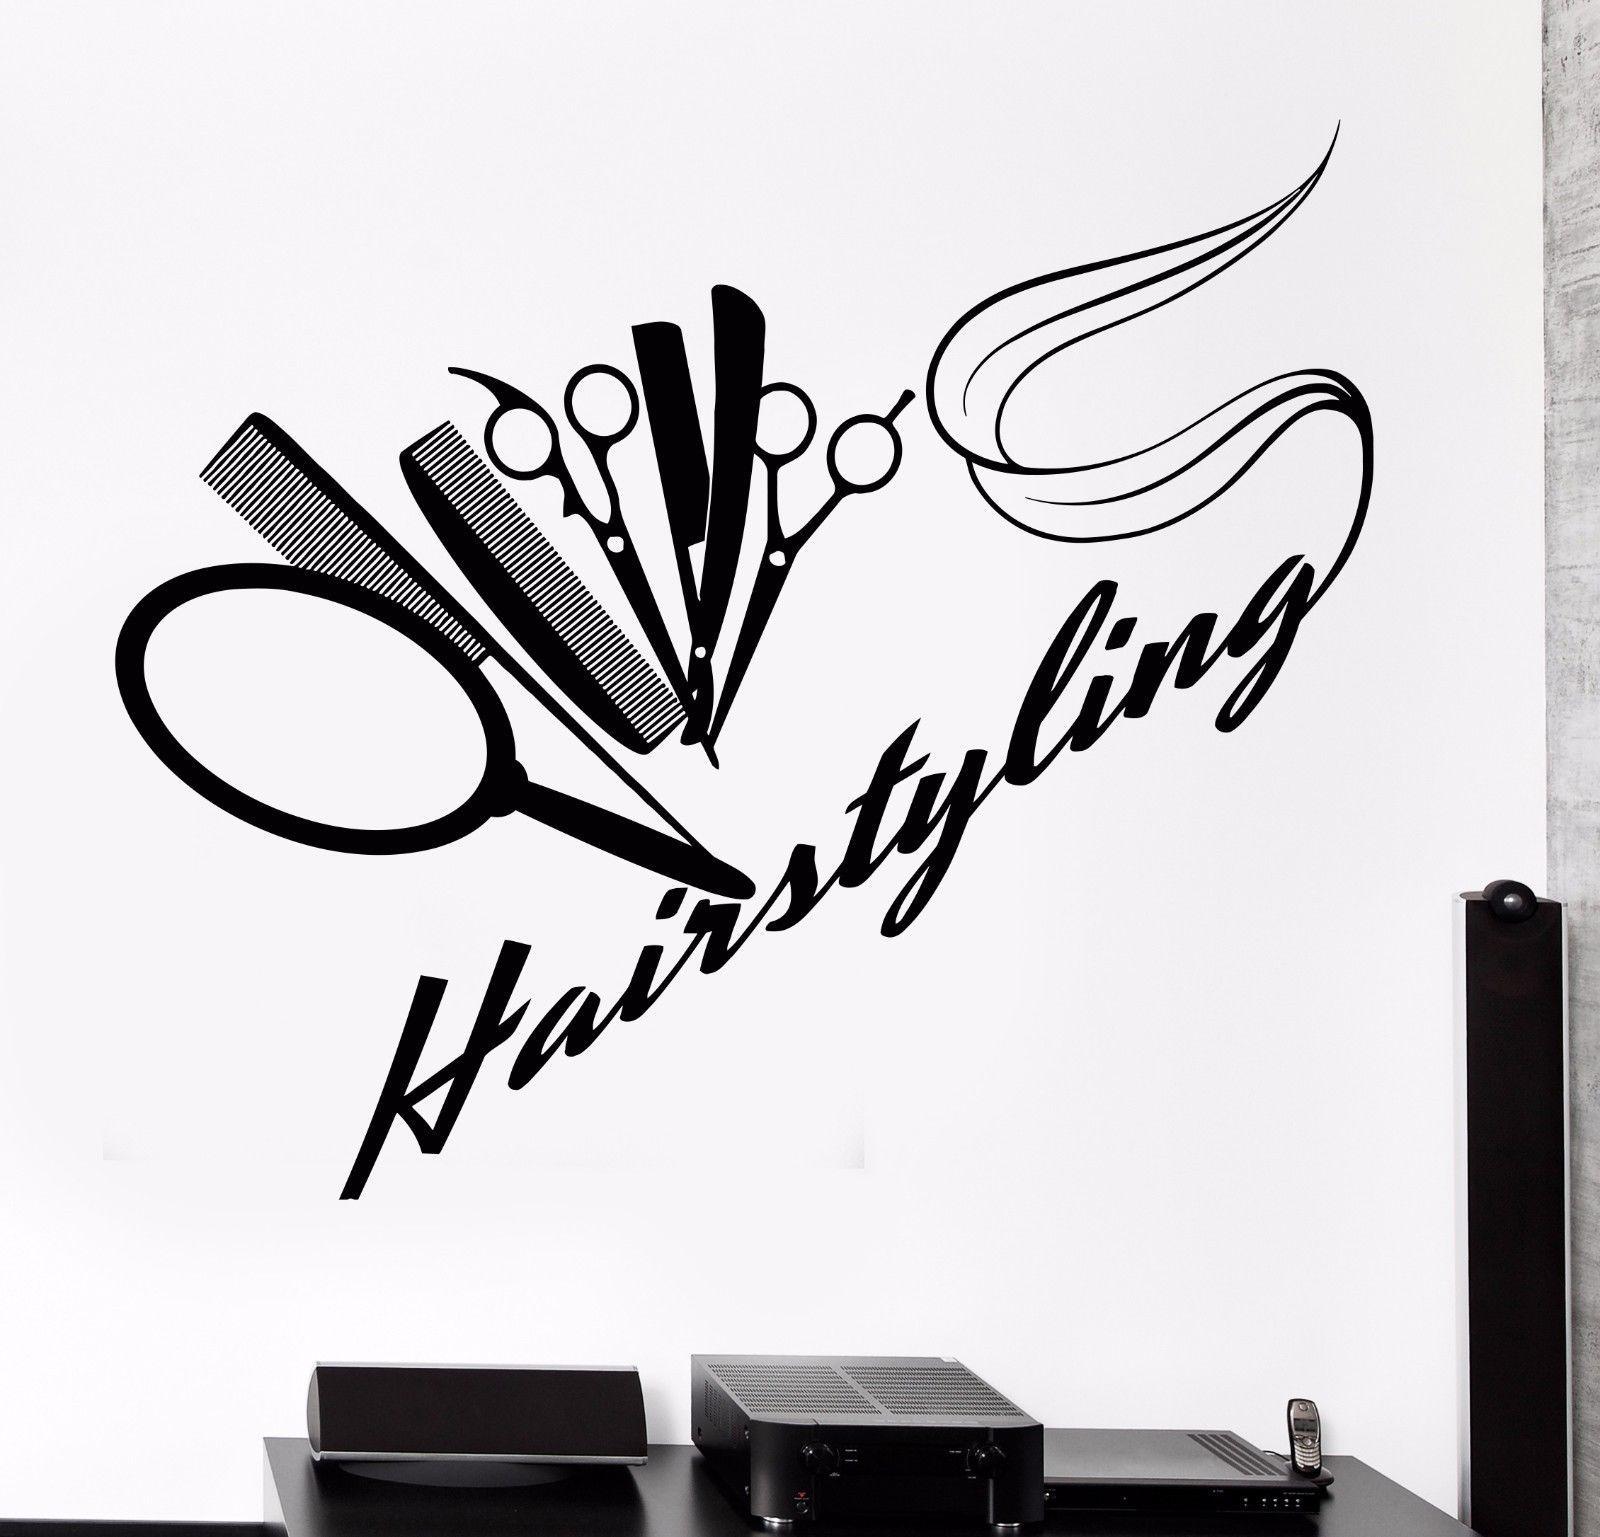 Vinyl wall decal barbershop hairdressing salon hair stylist stickers